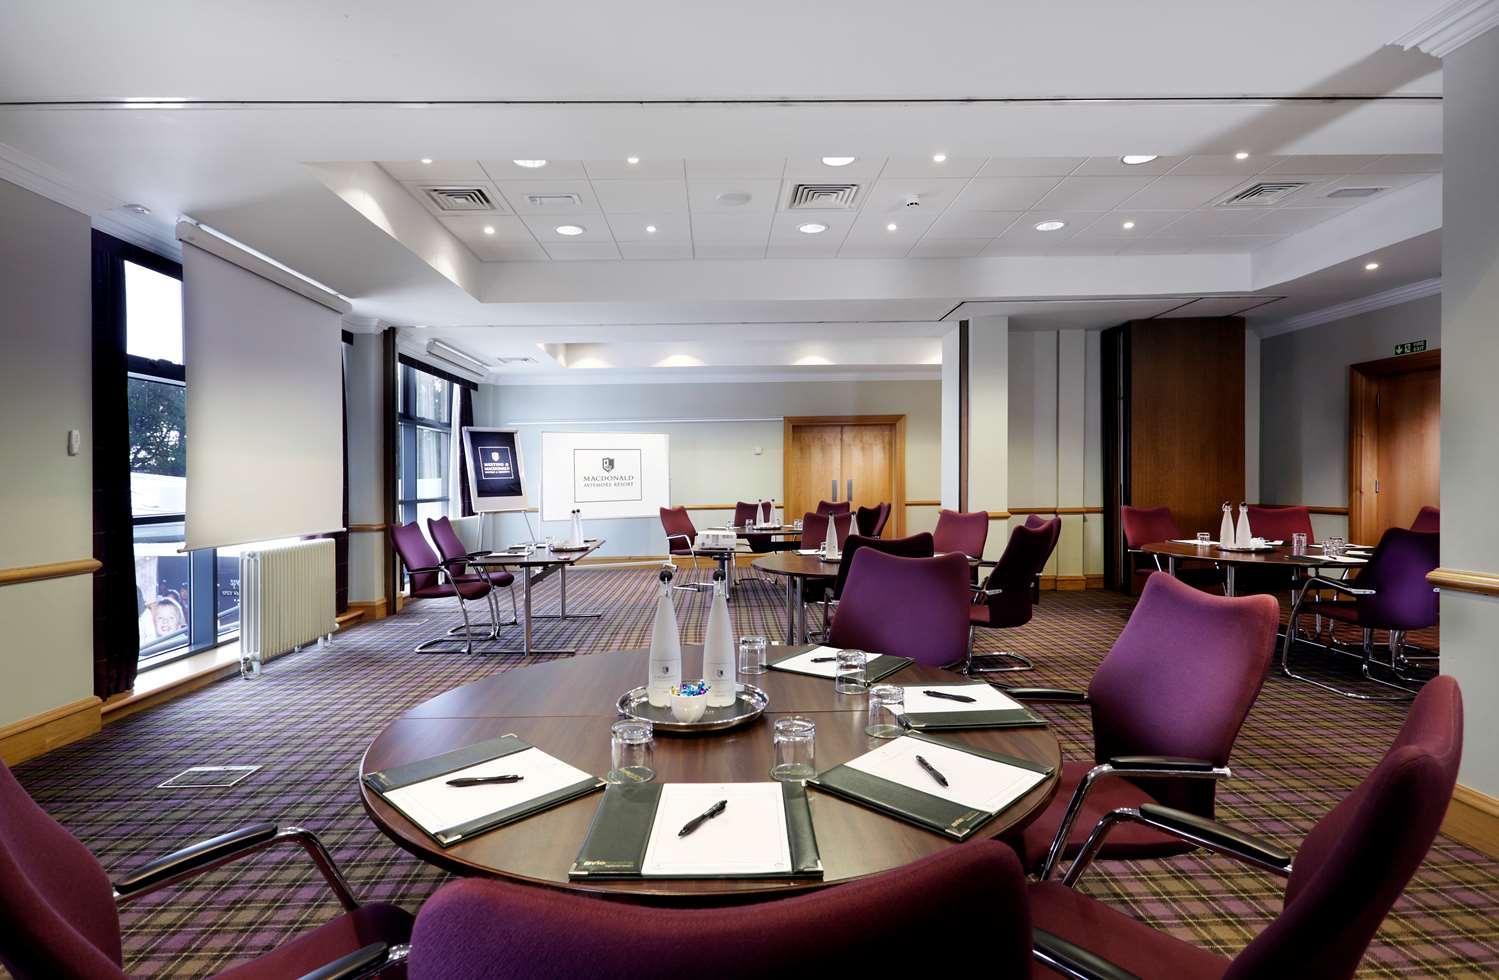 Alvie Morlich Glenmore meeting room